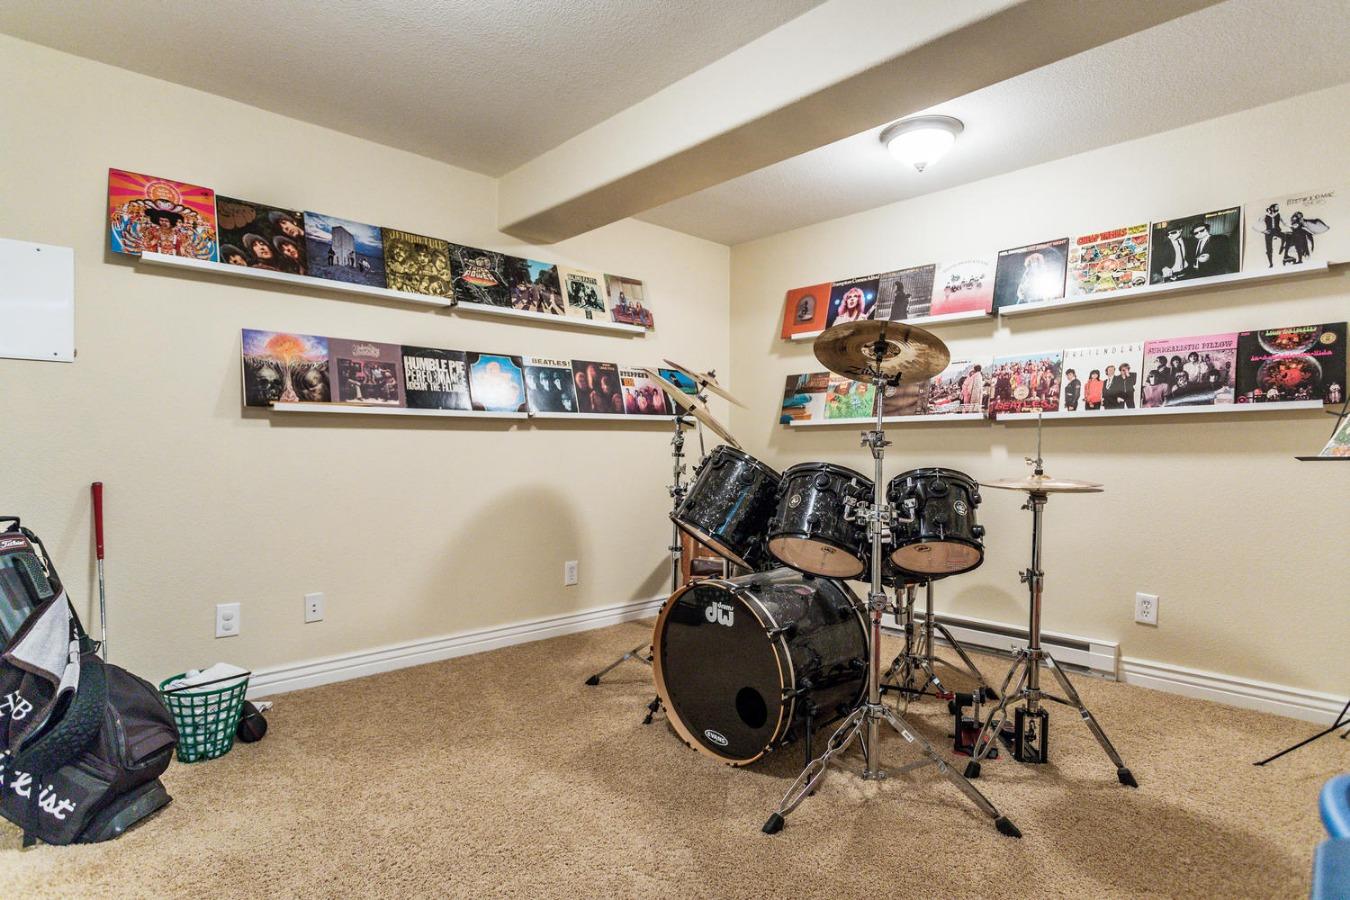 Bonus Finished Craft/Hobby Room in Basement